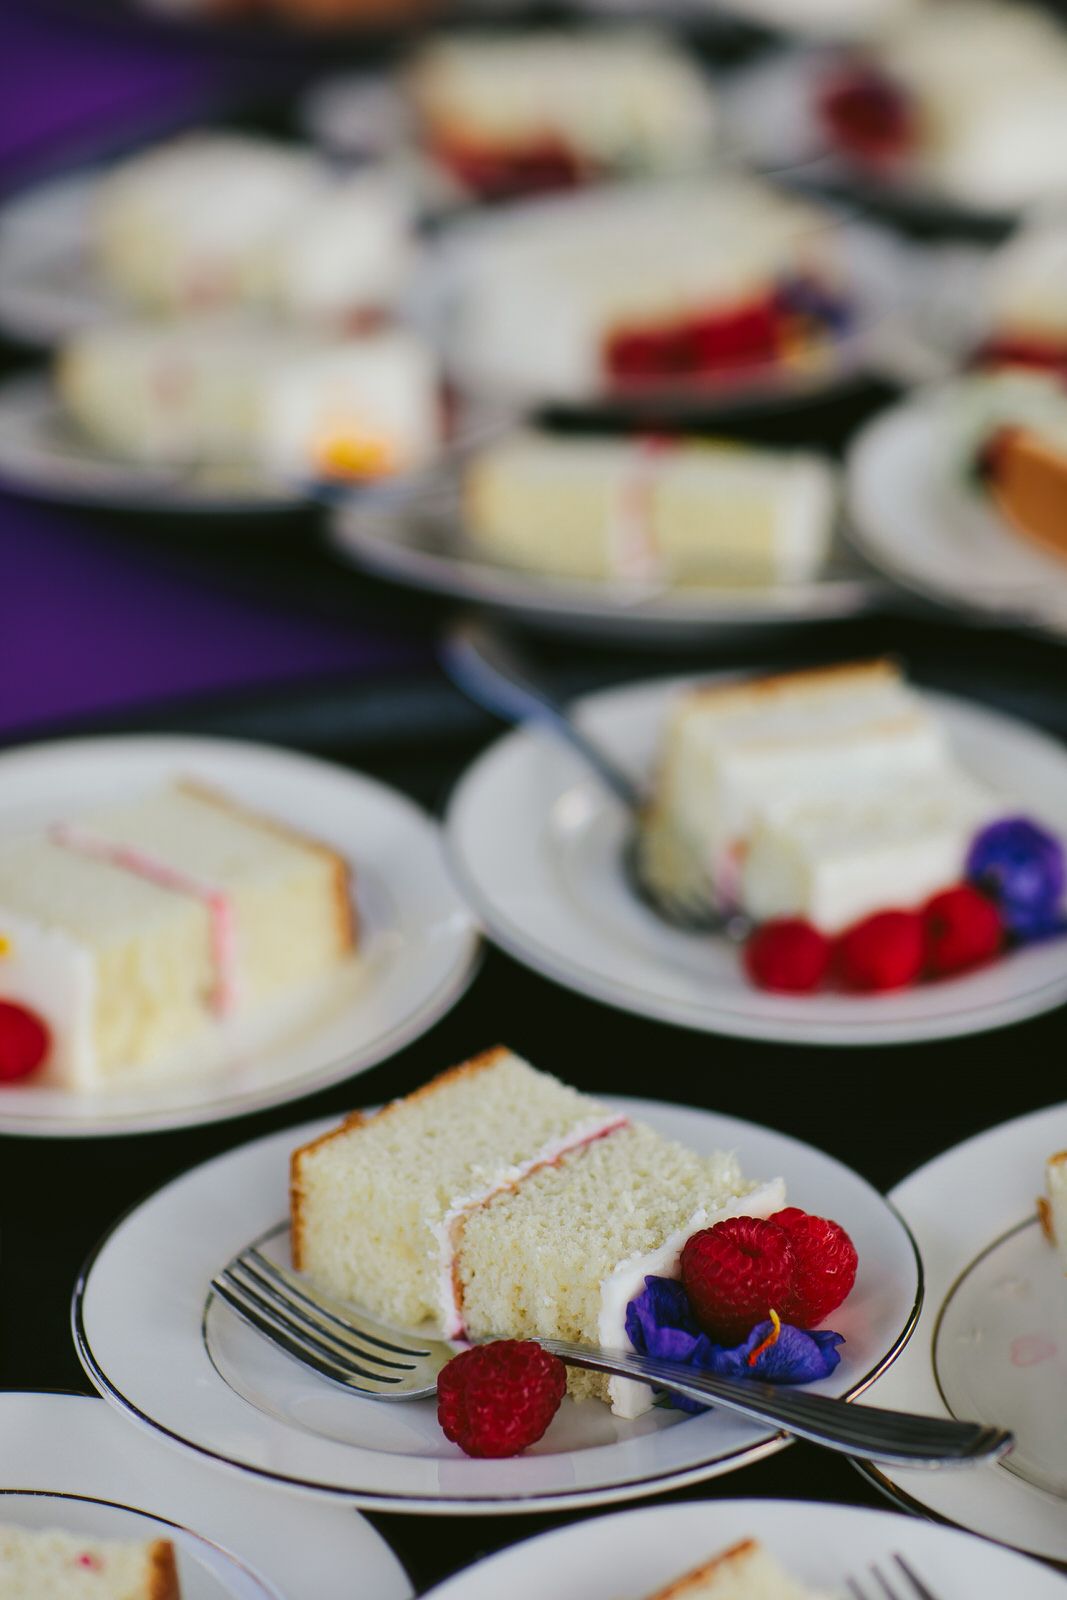 kashi-wedding-reception-tiny-house-photo-desserts.jpg